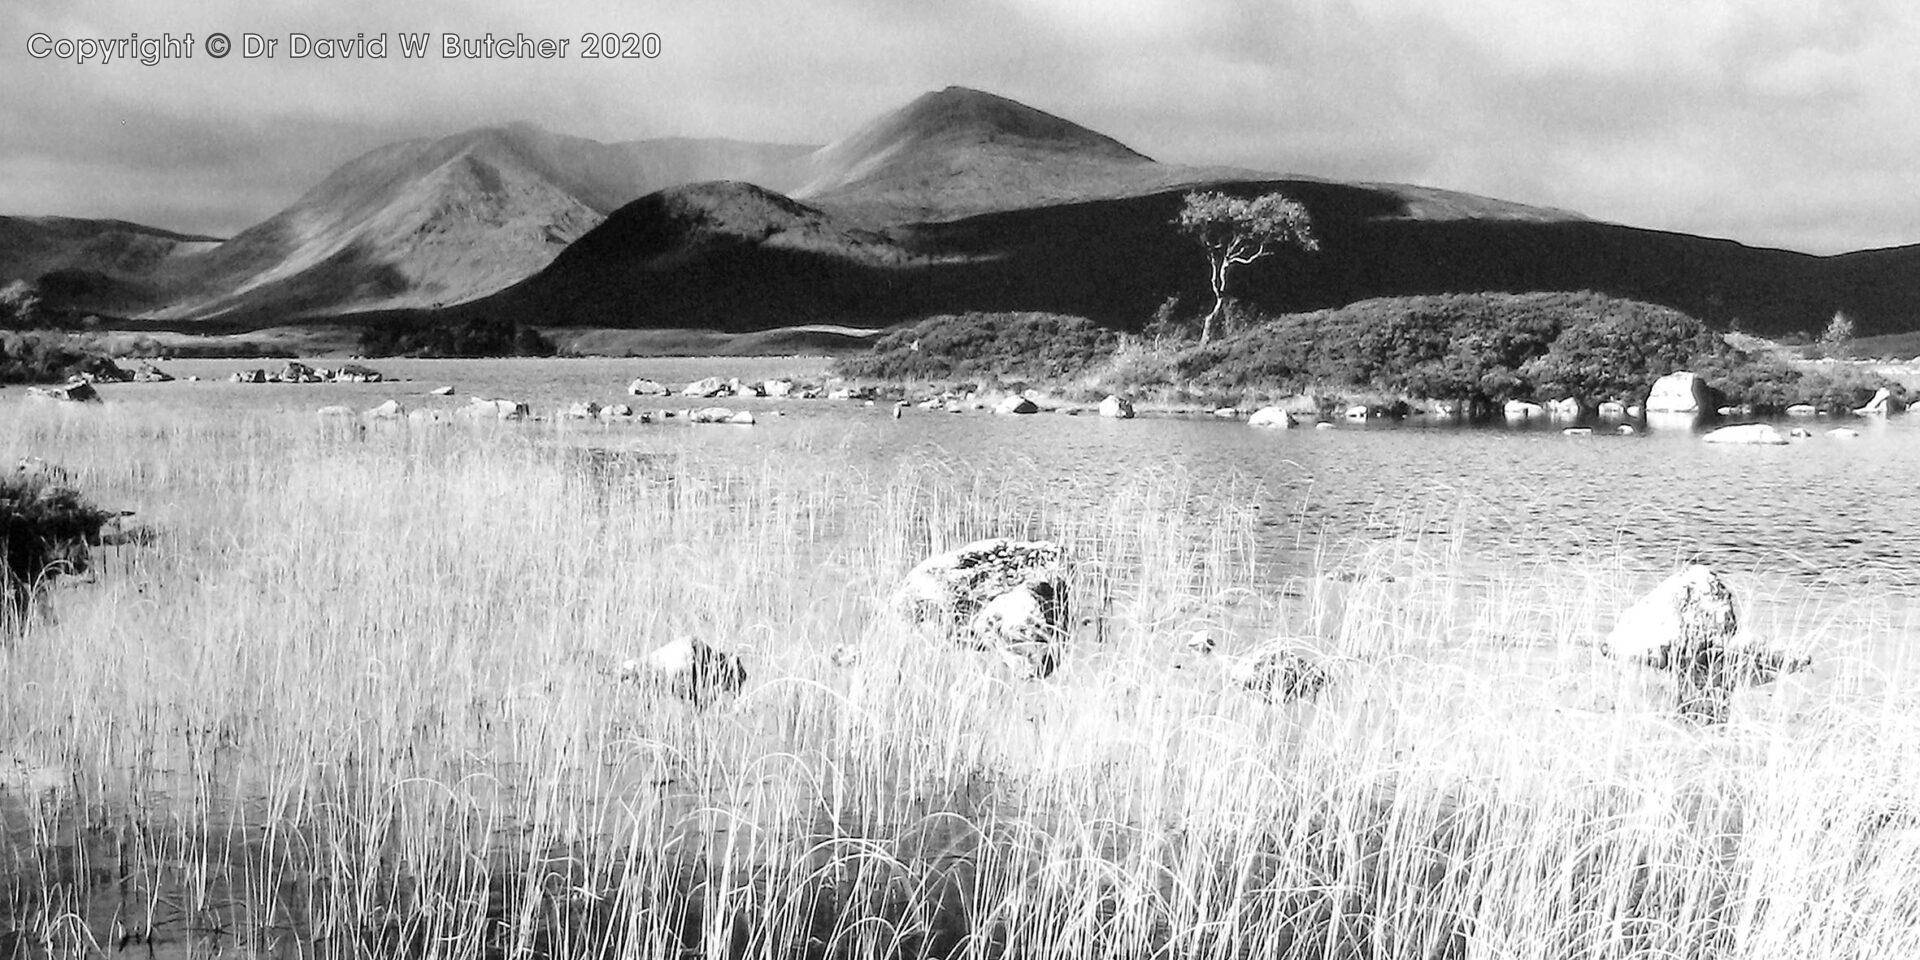 Black Mount, Lochan and Grasses, Rannoch Moor, Scotland